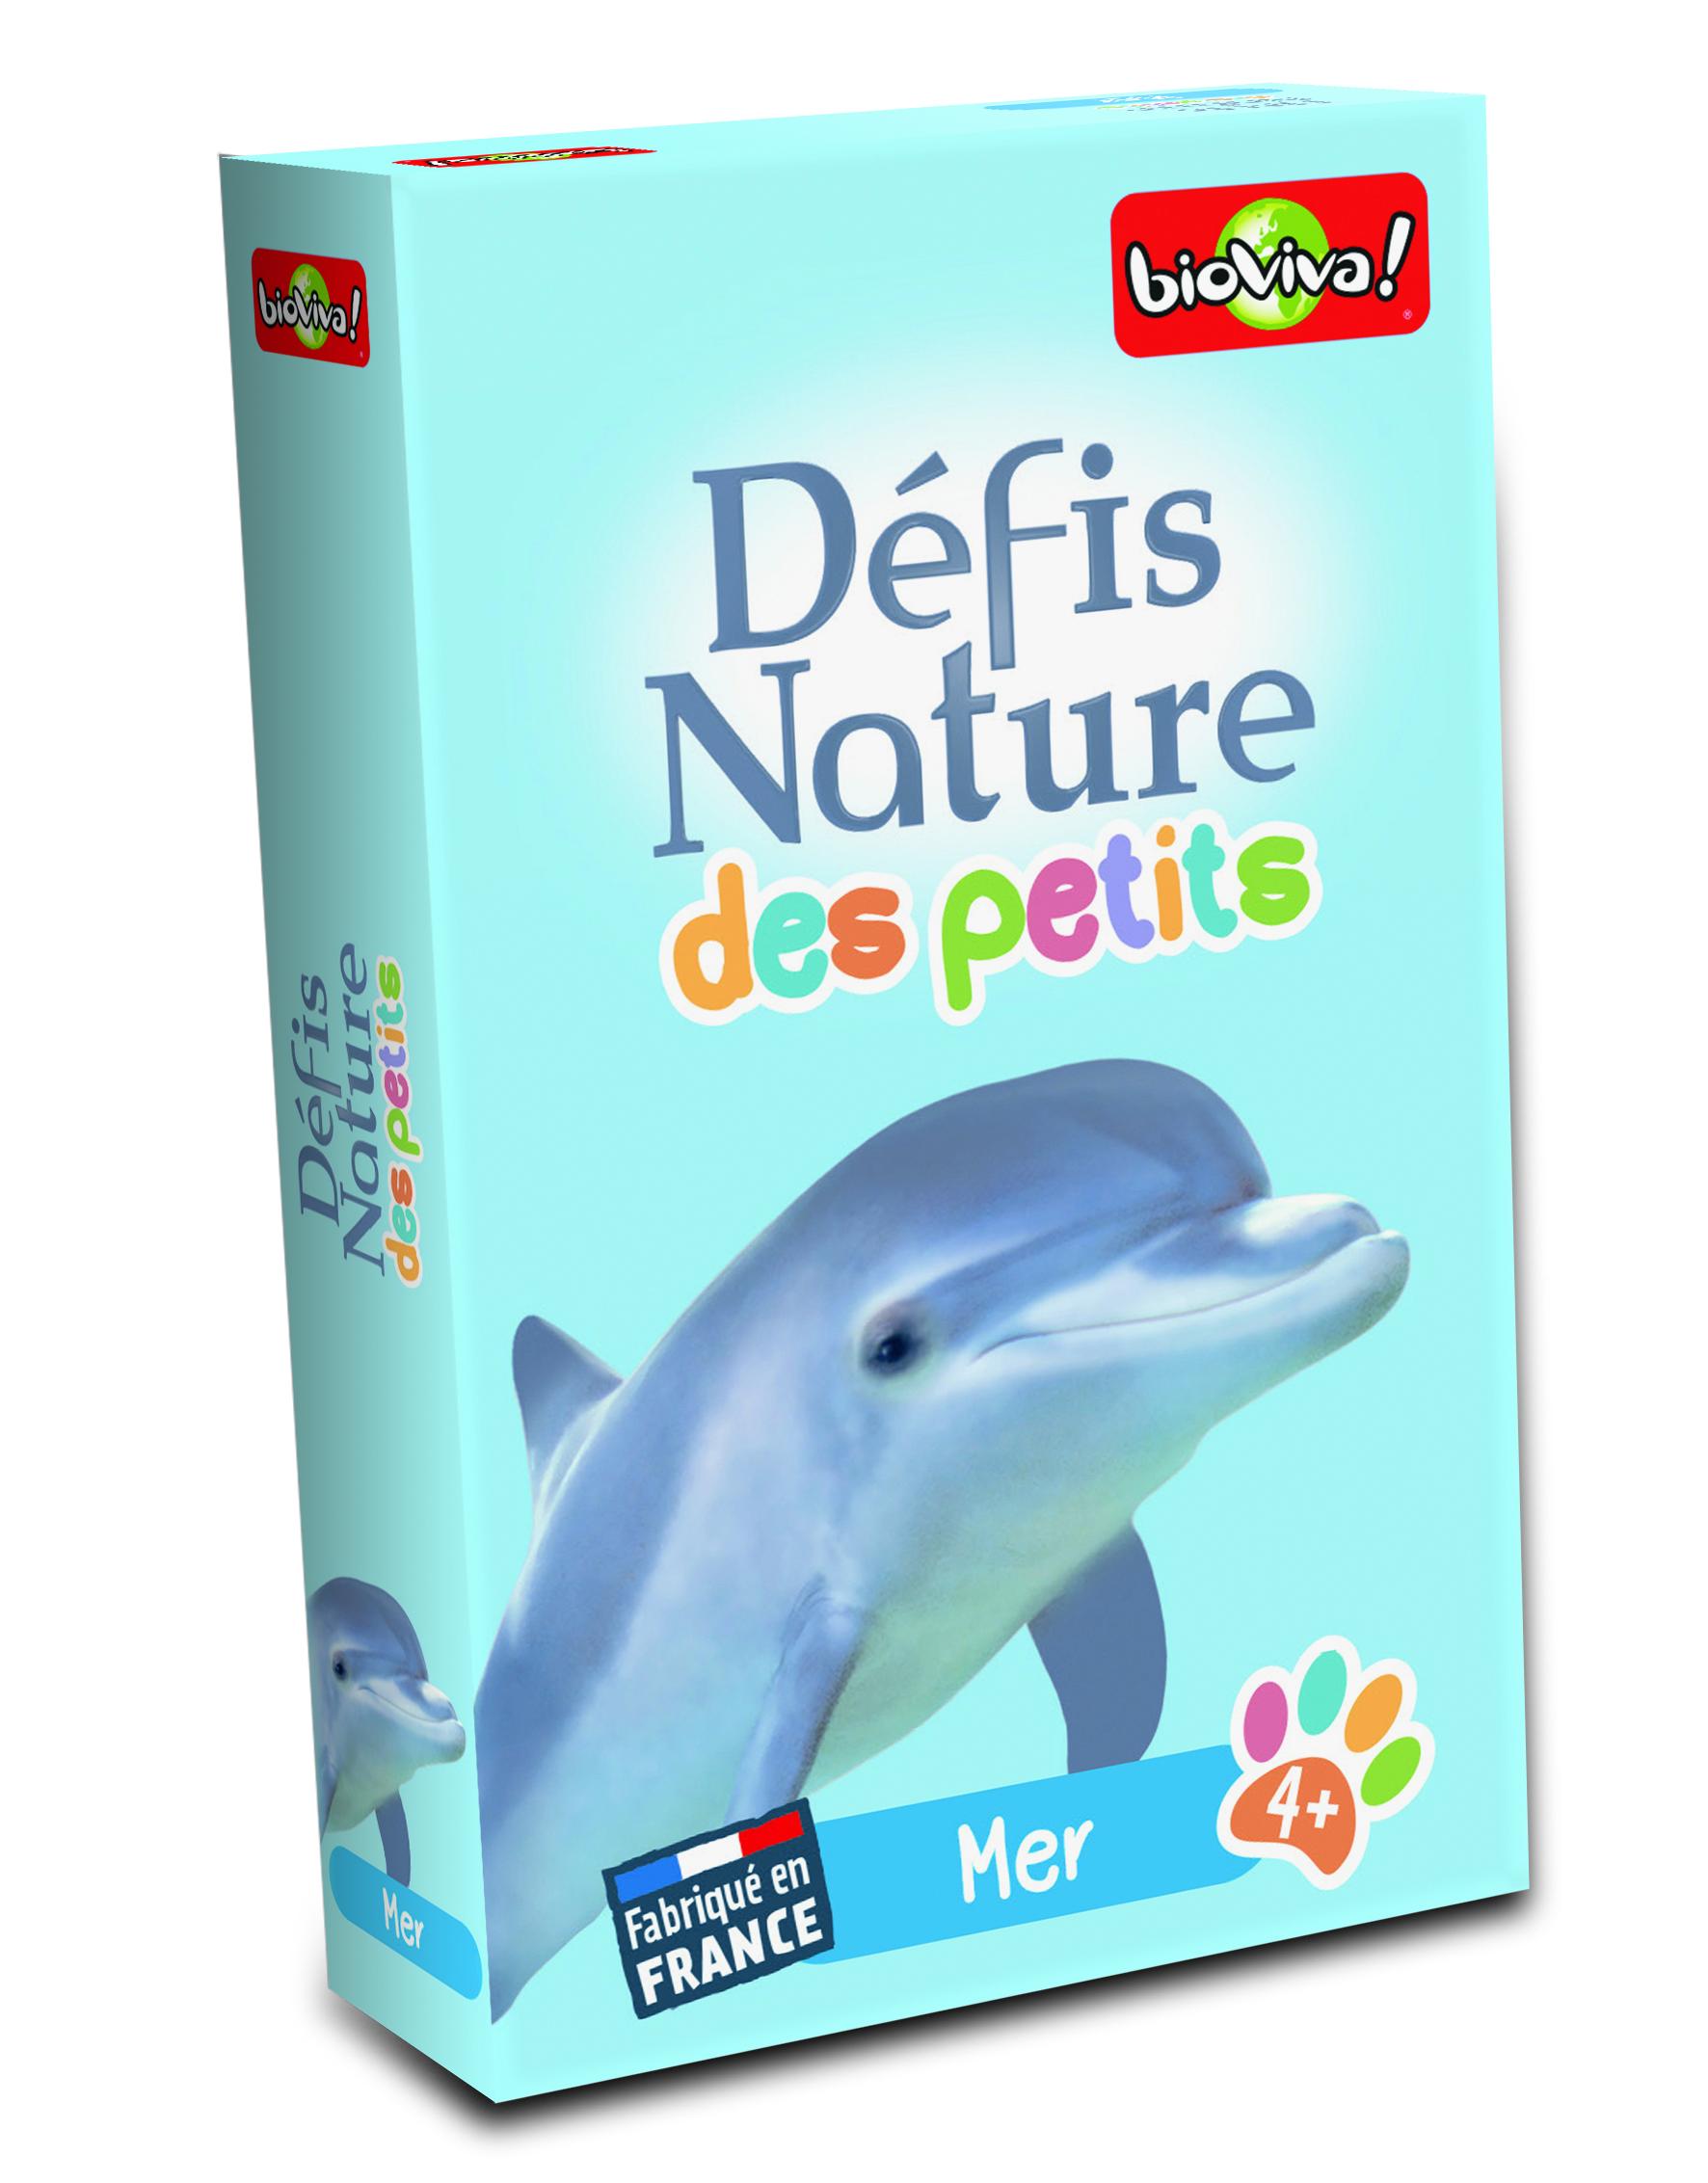 Defis Nature des Petits-Mer-Bioviva-Couv-Jeu de societe-ludovox